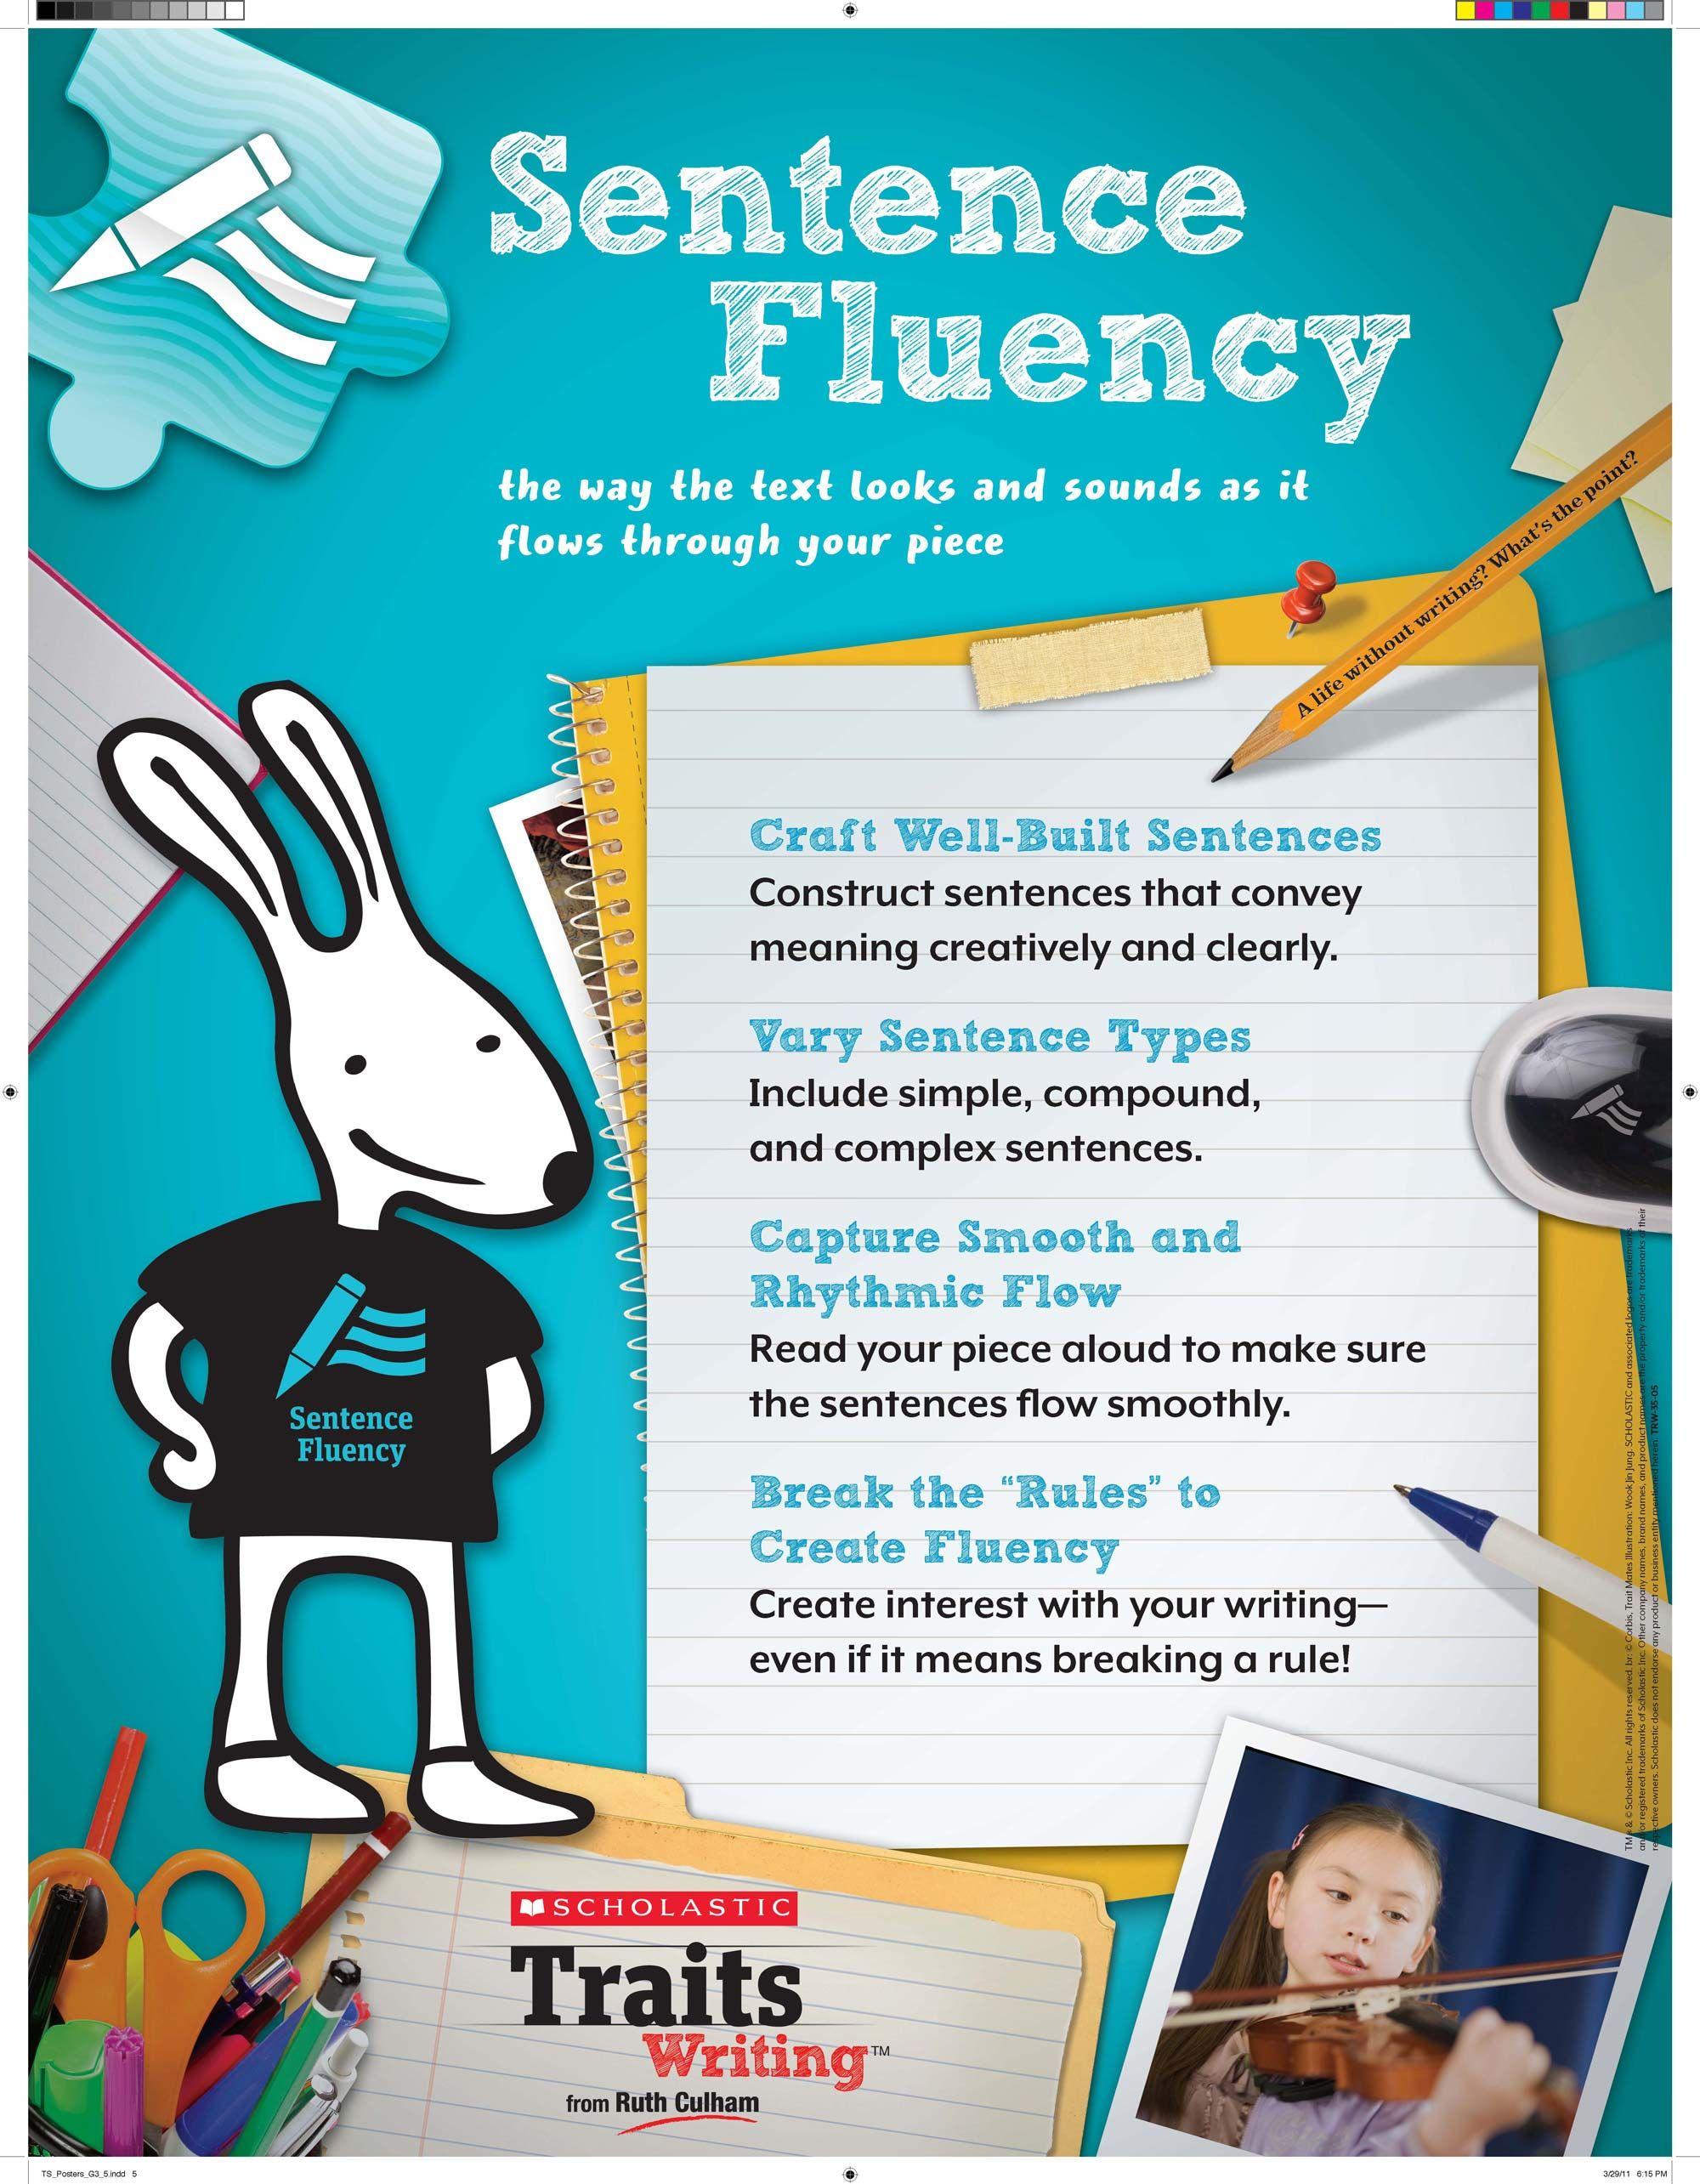 Week 4 Chart Of Information Regarding Sentence Fluency